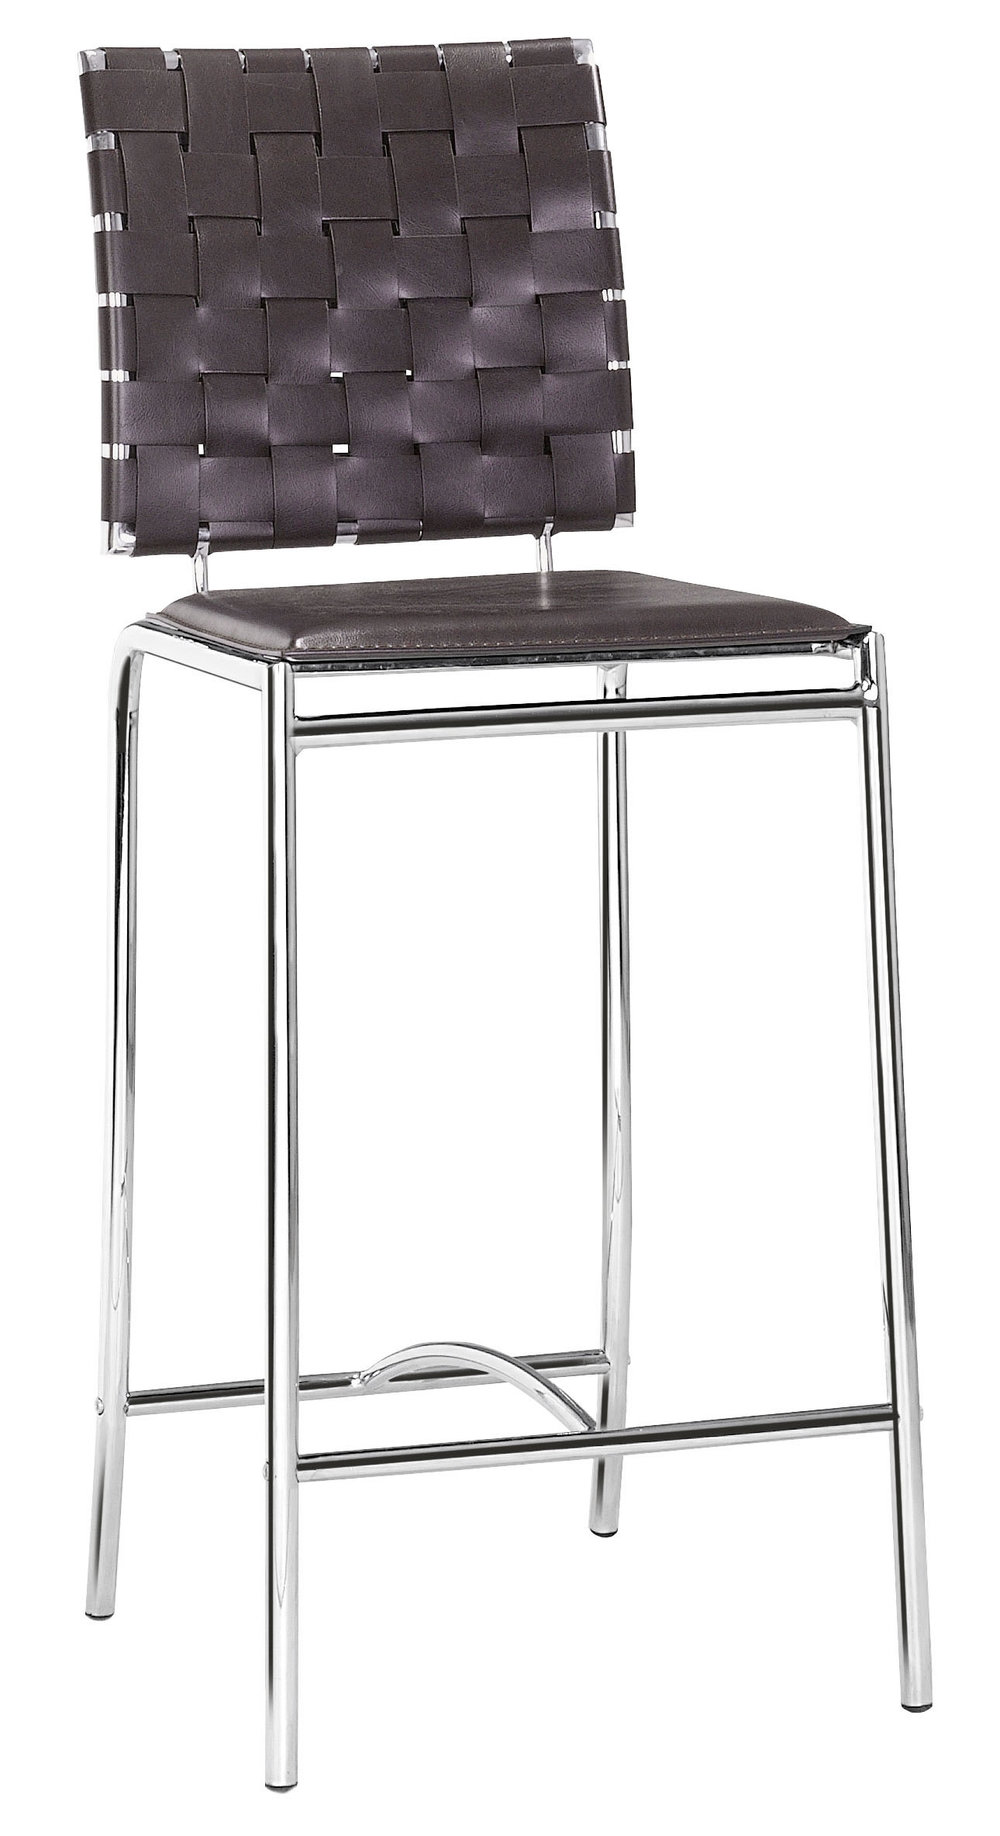 Zuo Modern Contemporary - Criss Cross Counter Chair - Set of 2 - Espresso